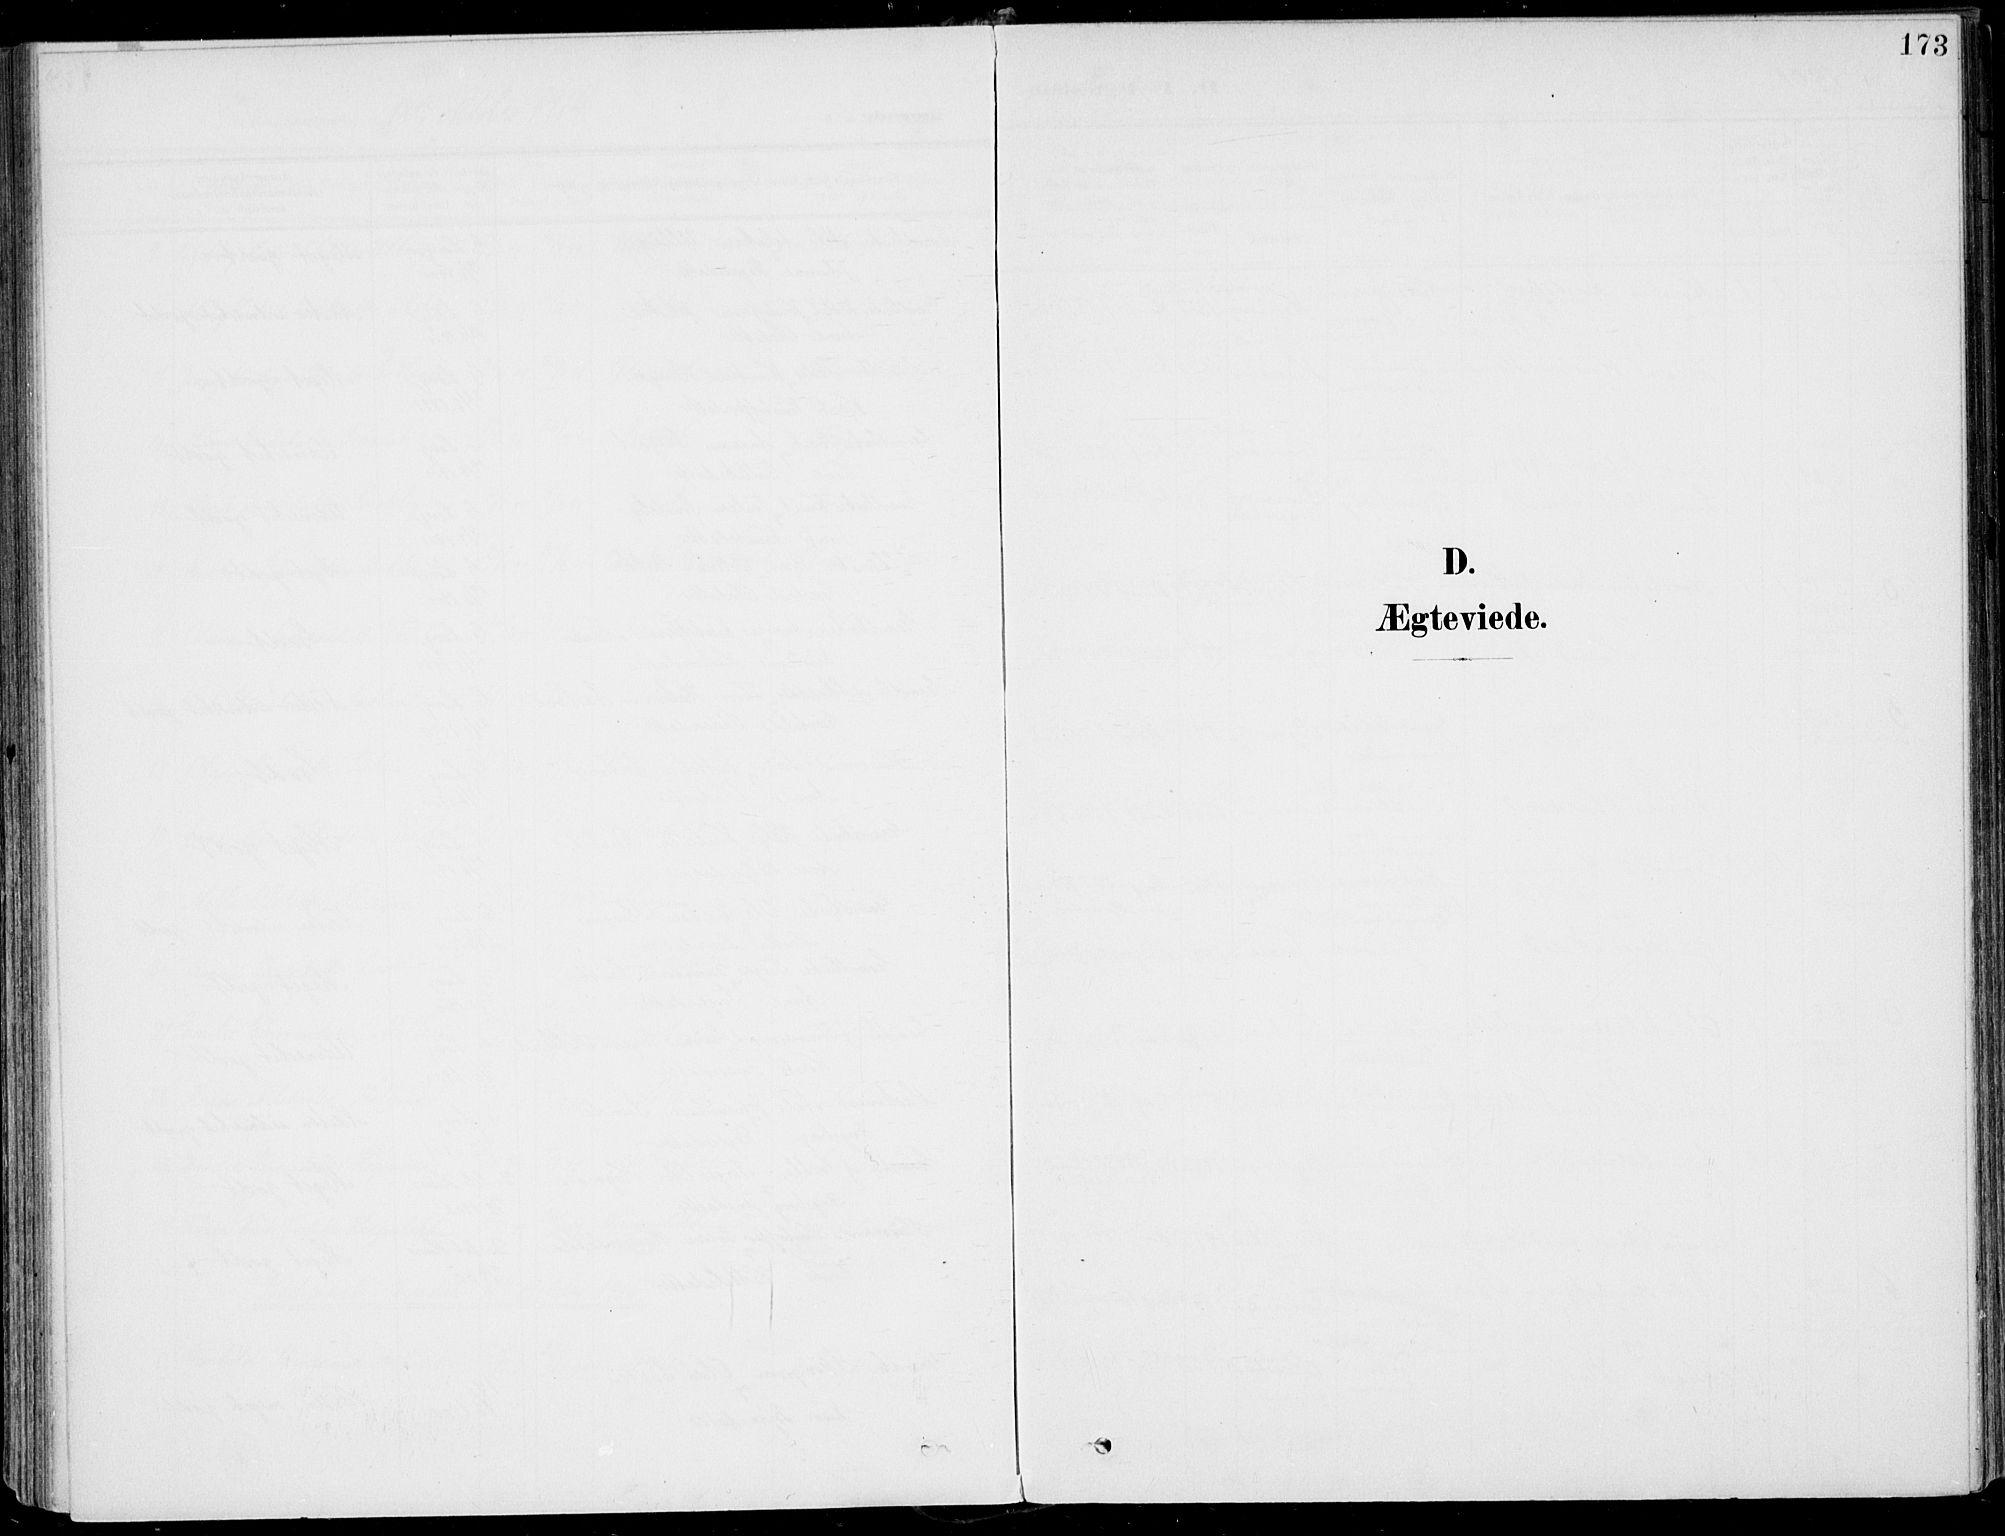 SAKO, Sigdal kirkebøker, F/Fb/L0002: Ministerialbok nr. II 2, 1901-1914, s. 173